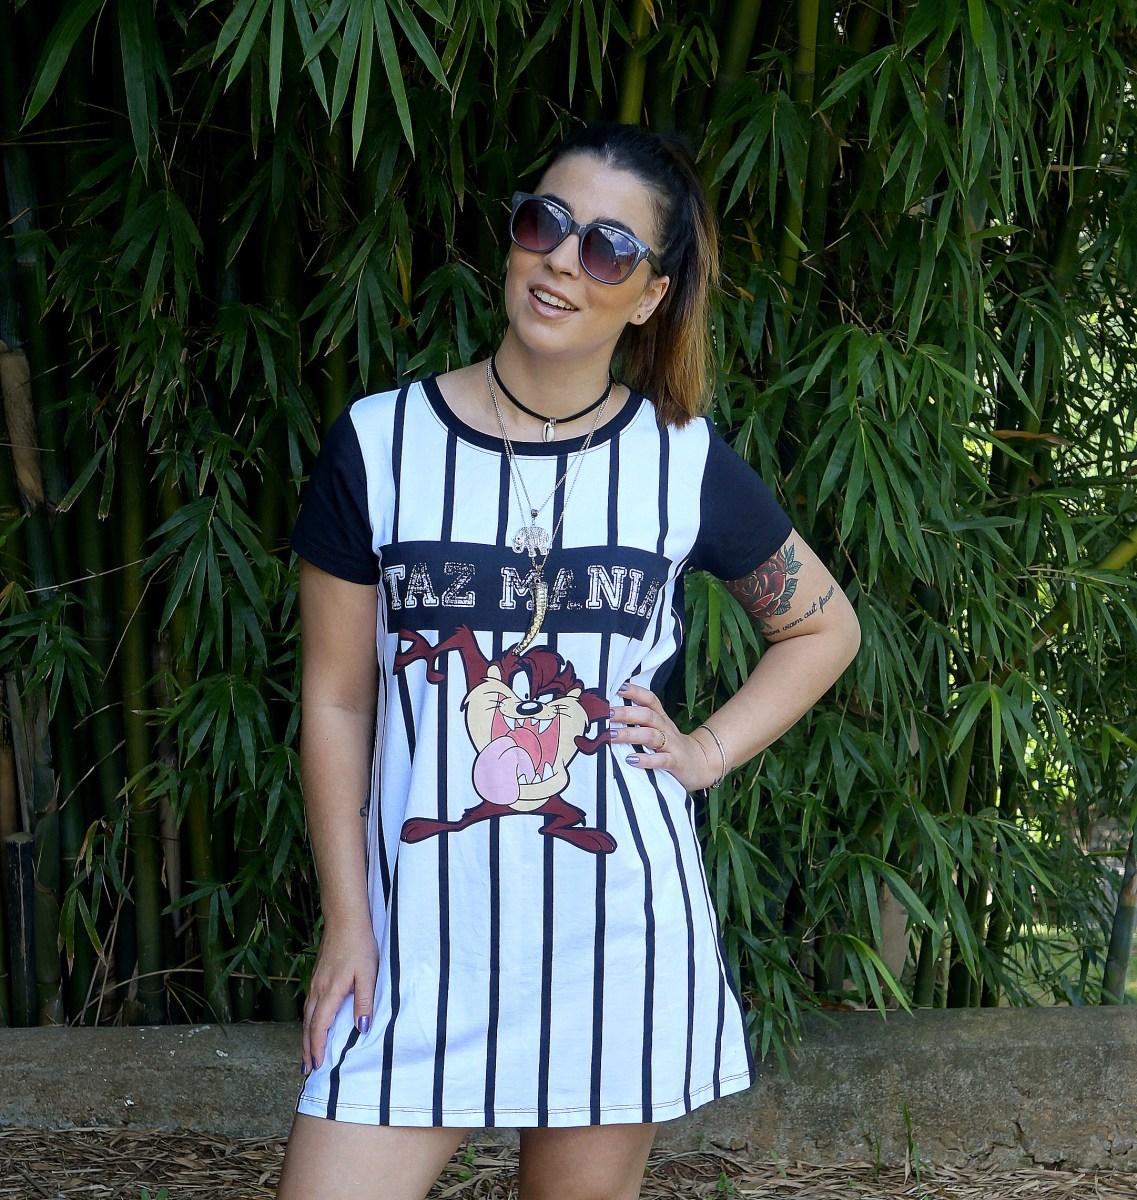 Look: T-shirt dress Taz mania